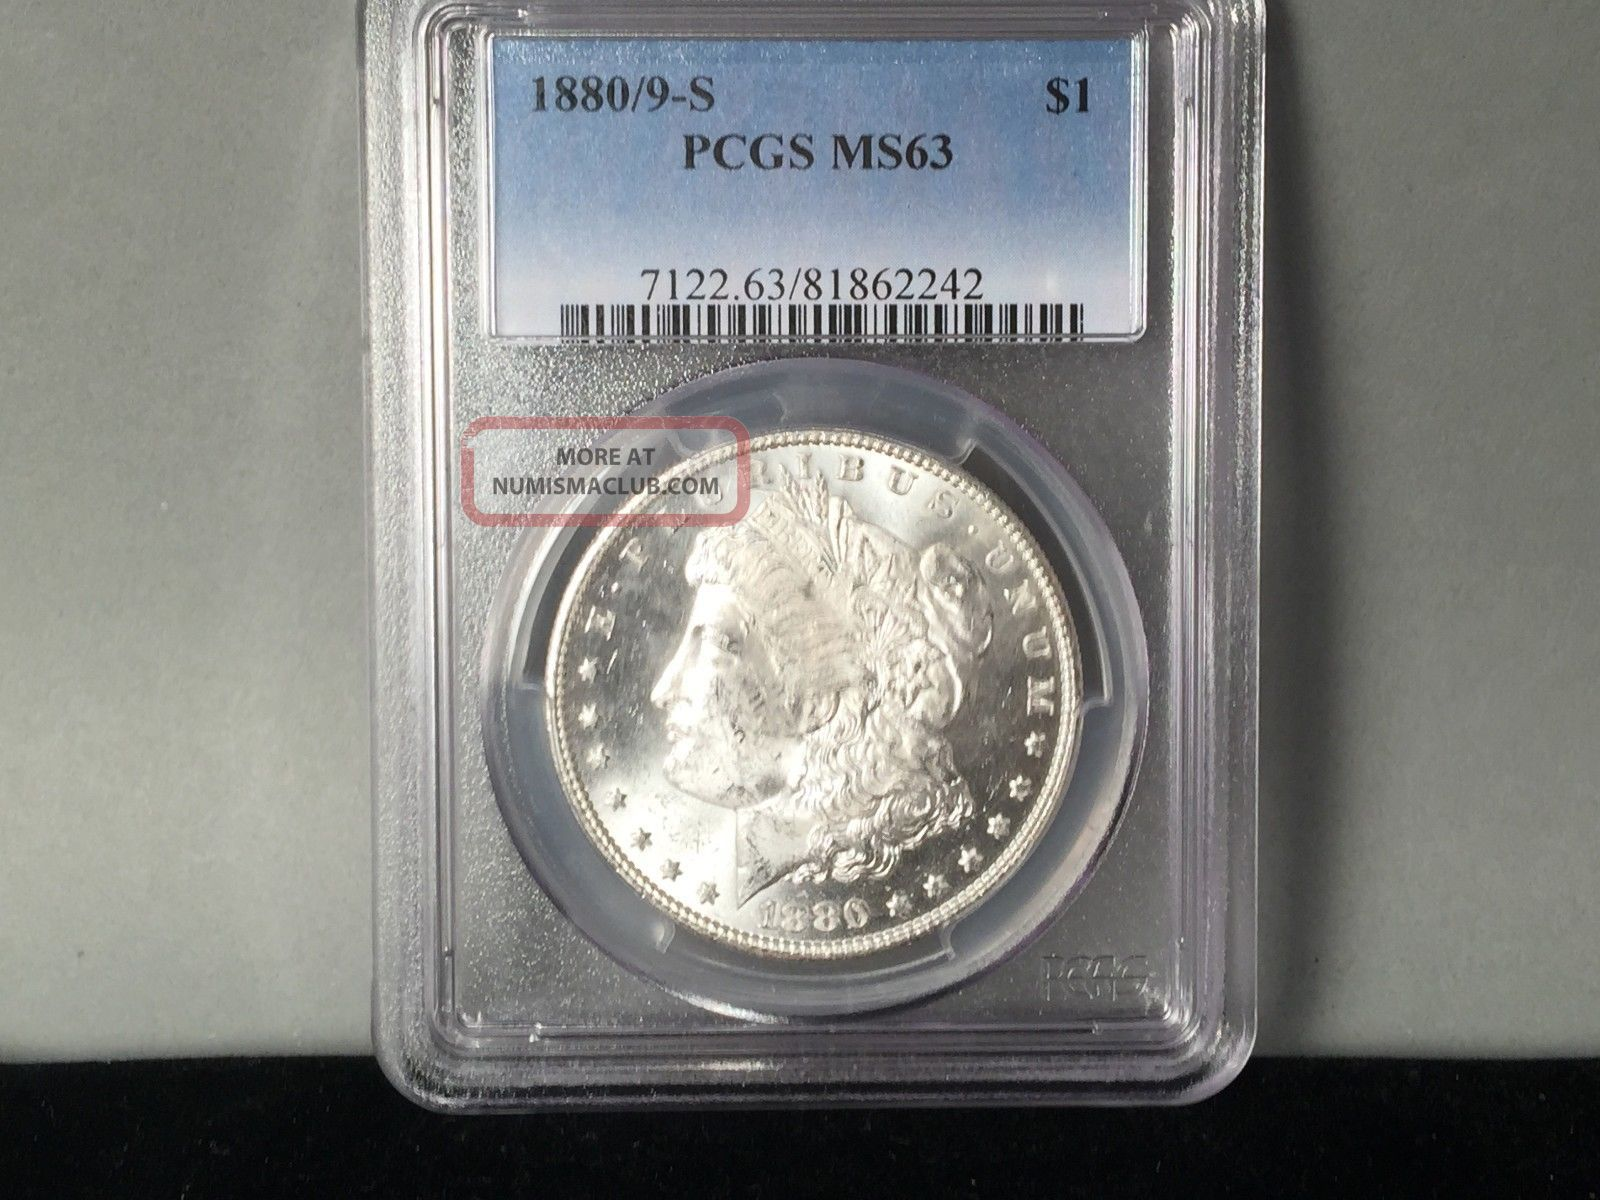 1880/9 - S Pcgs 64 Morgan Silver Dollar Blast White Dollars photo